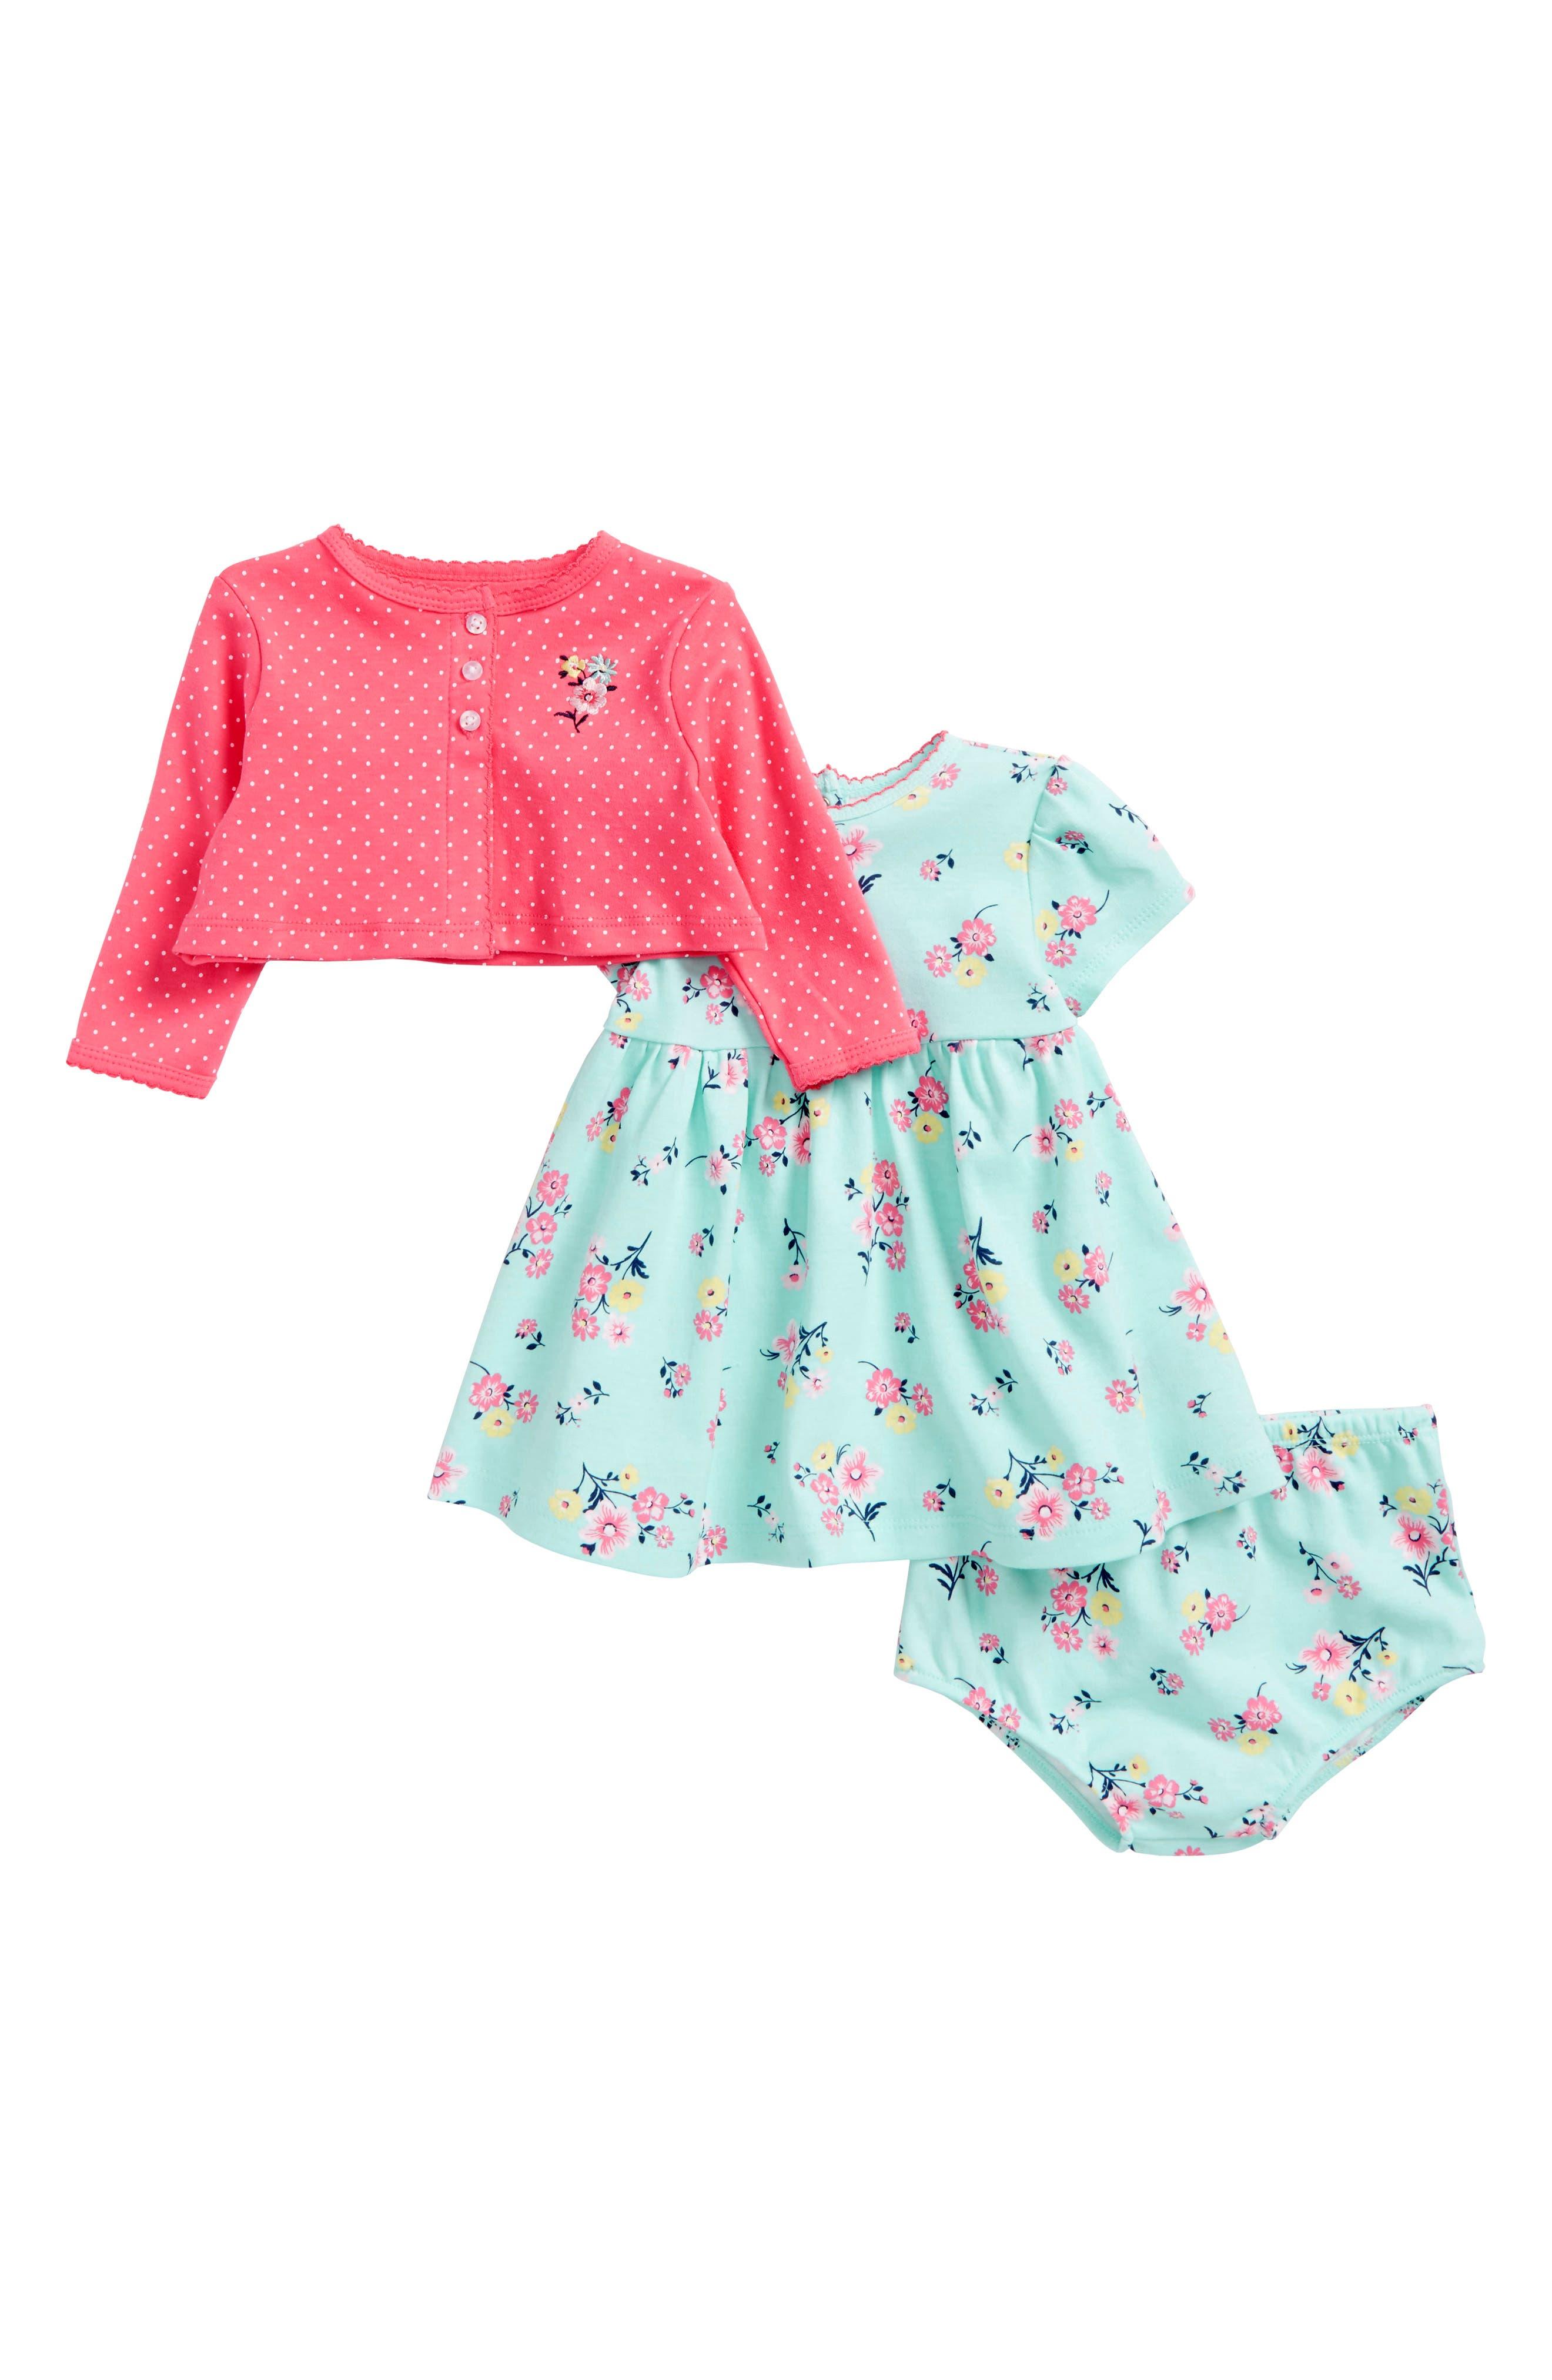 Main Image - Little Me Floral Dress & Cardigan Set (Baby Girls)